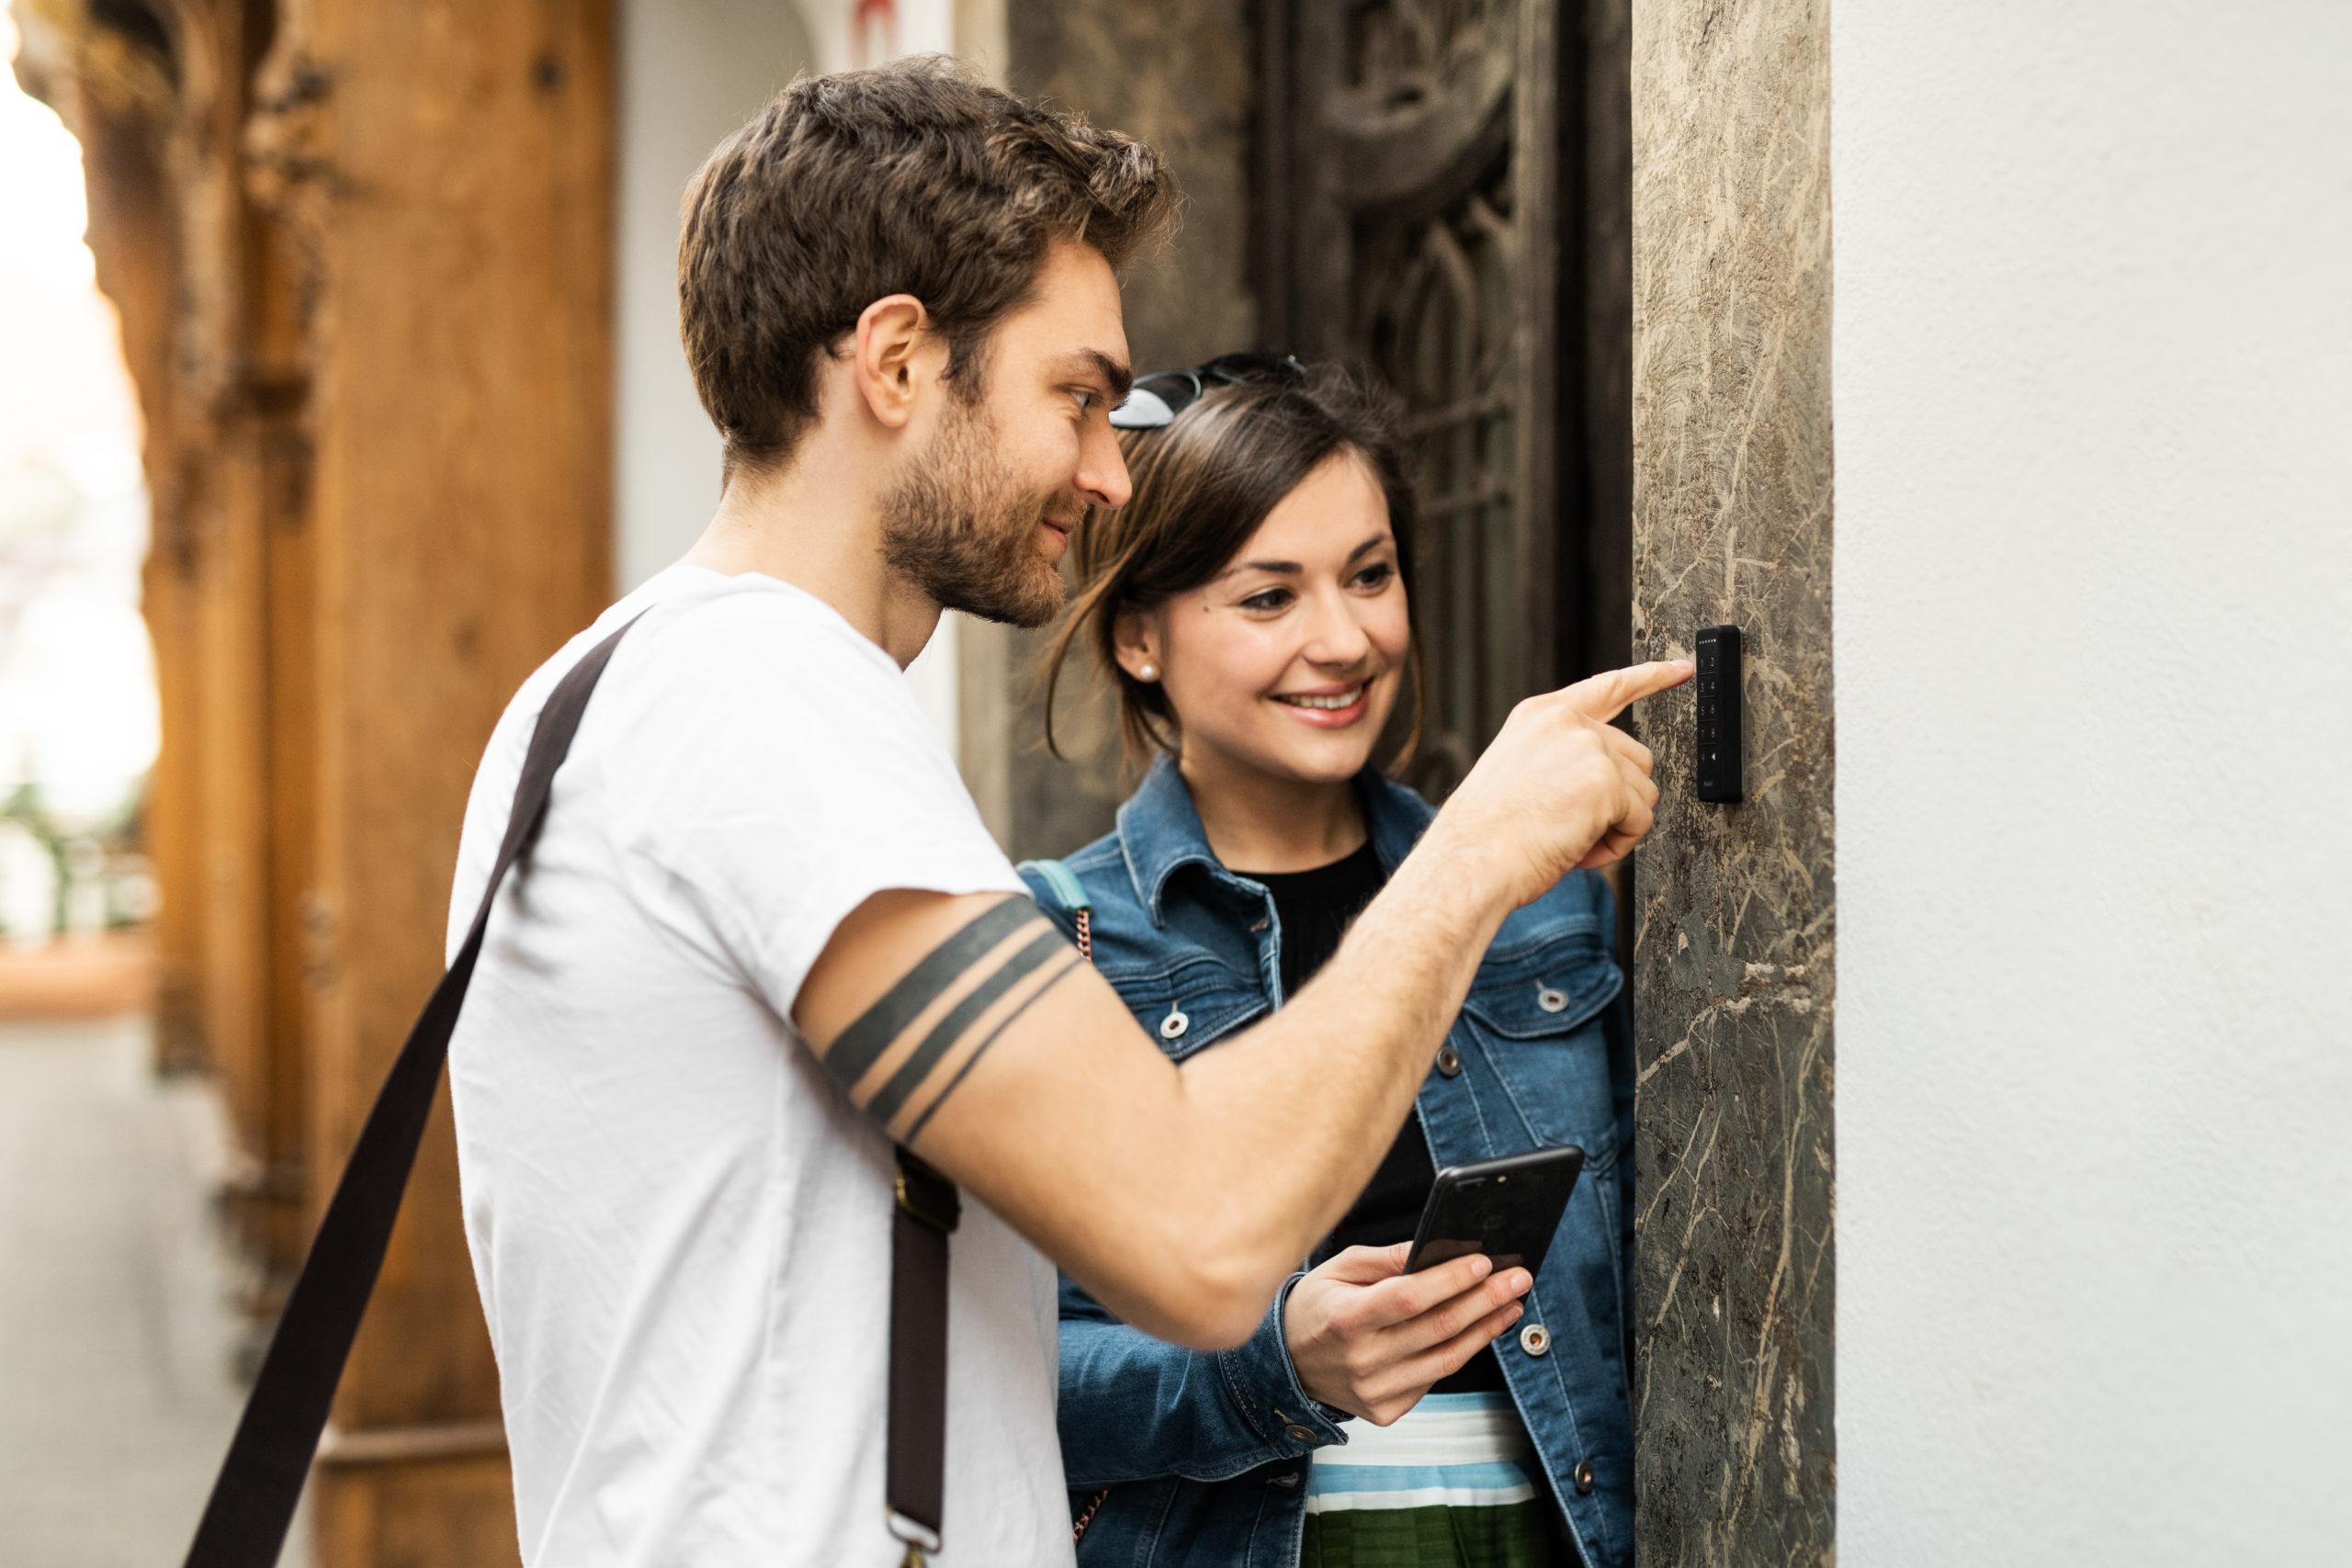 Airbnb Gäste beim der Ankunft - Easy access via NUKI Smart Home Schloss